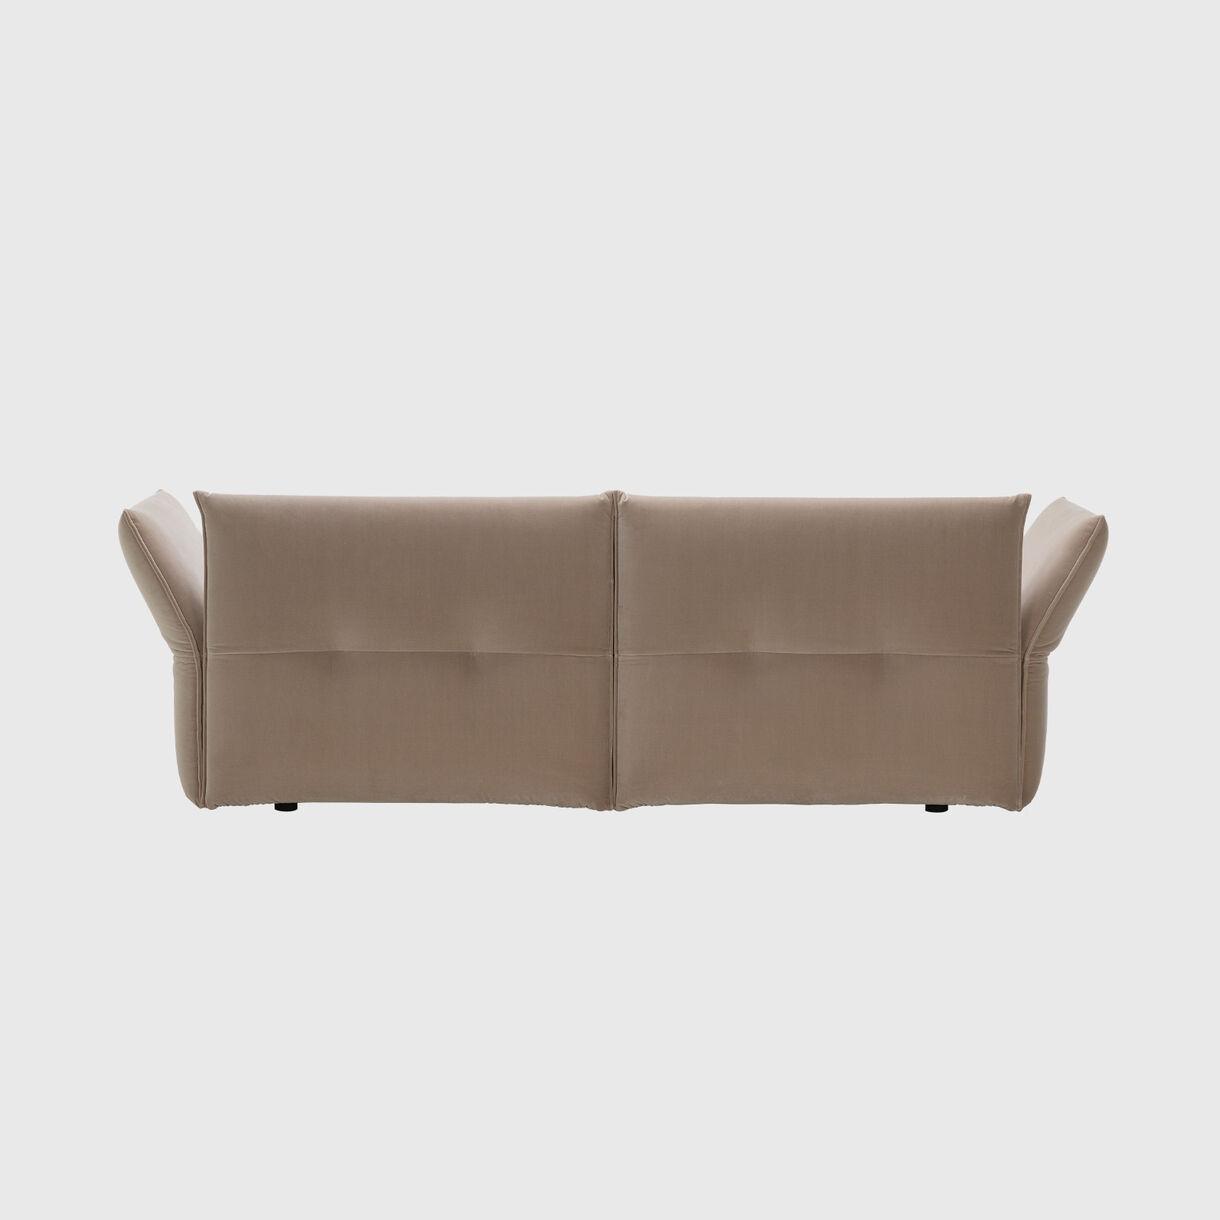 Mariposa Sofa, 3 Seater